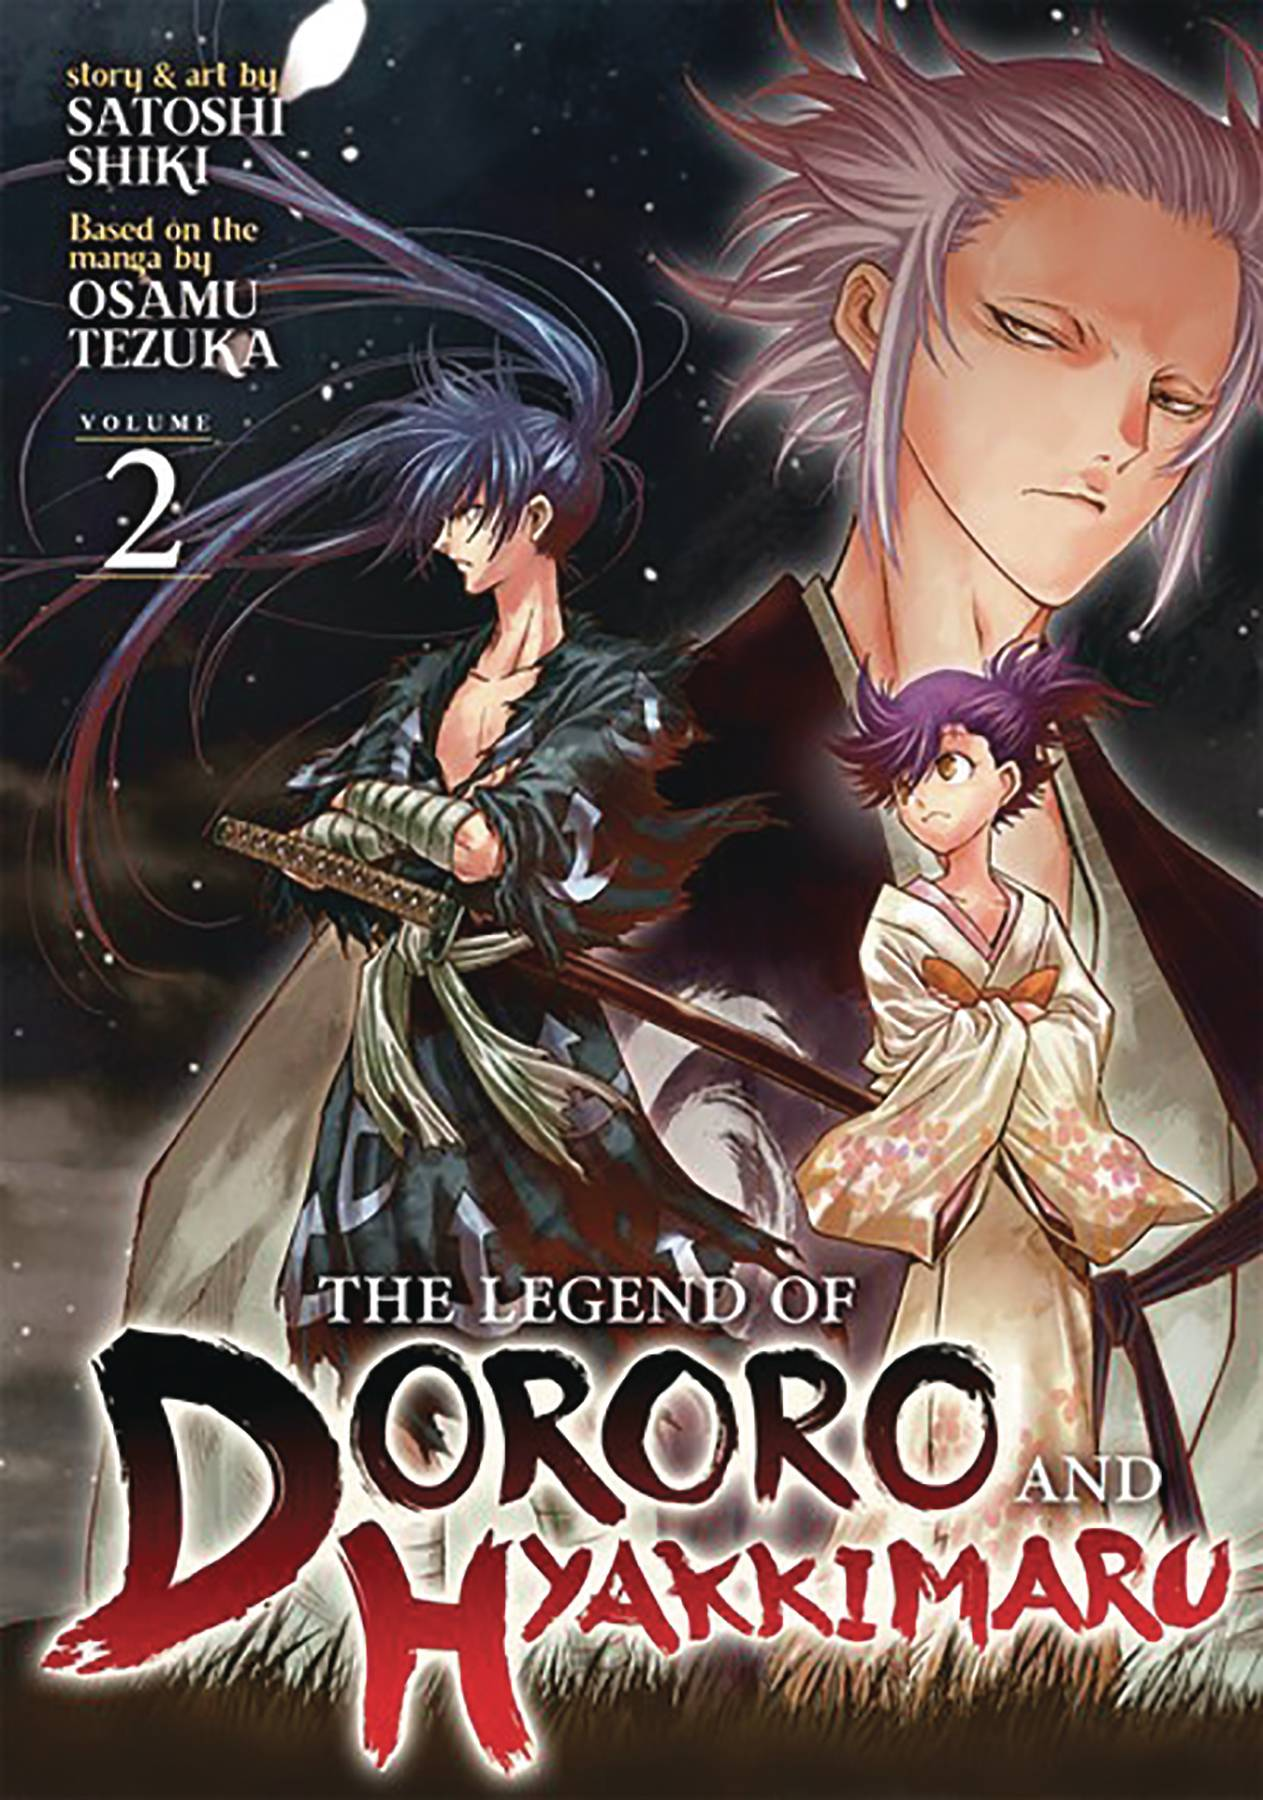 LEGEND OF DORORO & HYAKKIMARU GN 02